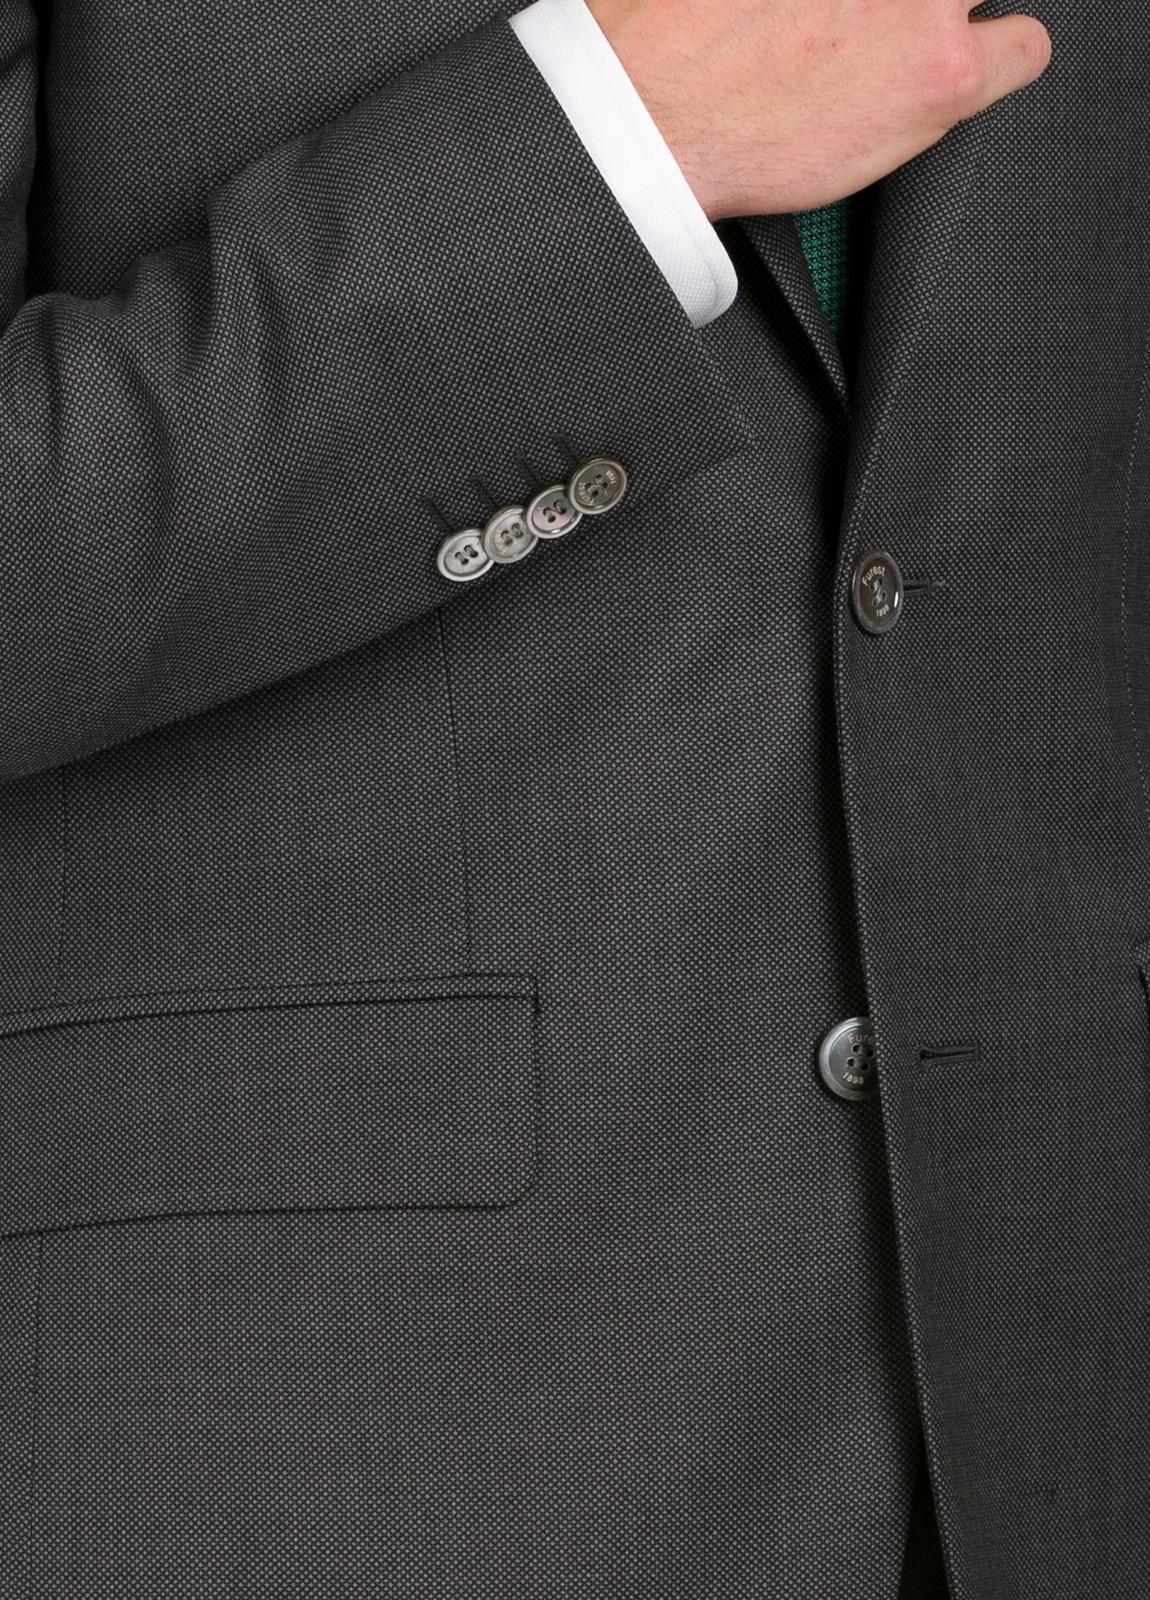 Traje liso SLIM FIT, tejido COMERO color gris, 100% Lana Virgen. - Ítem4